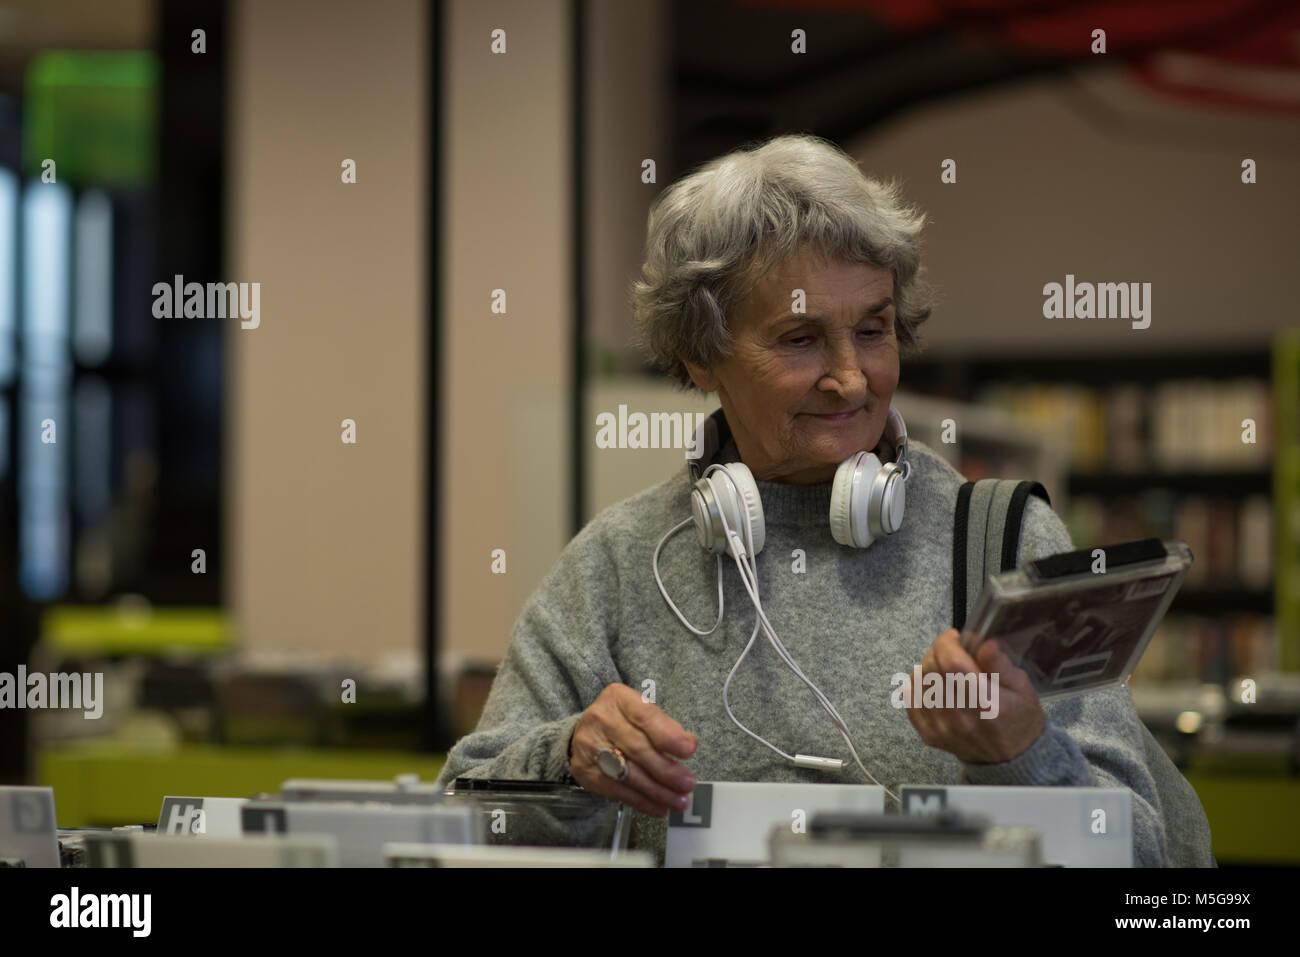 Senior woman choosing a dvd cassette - Stock Image